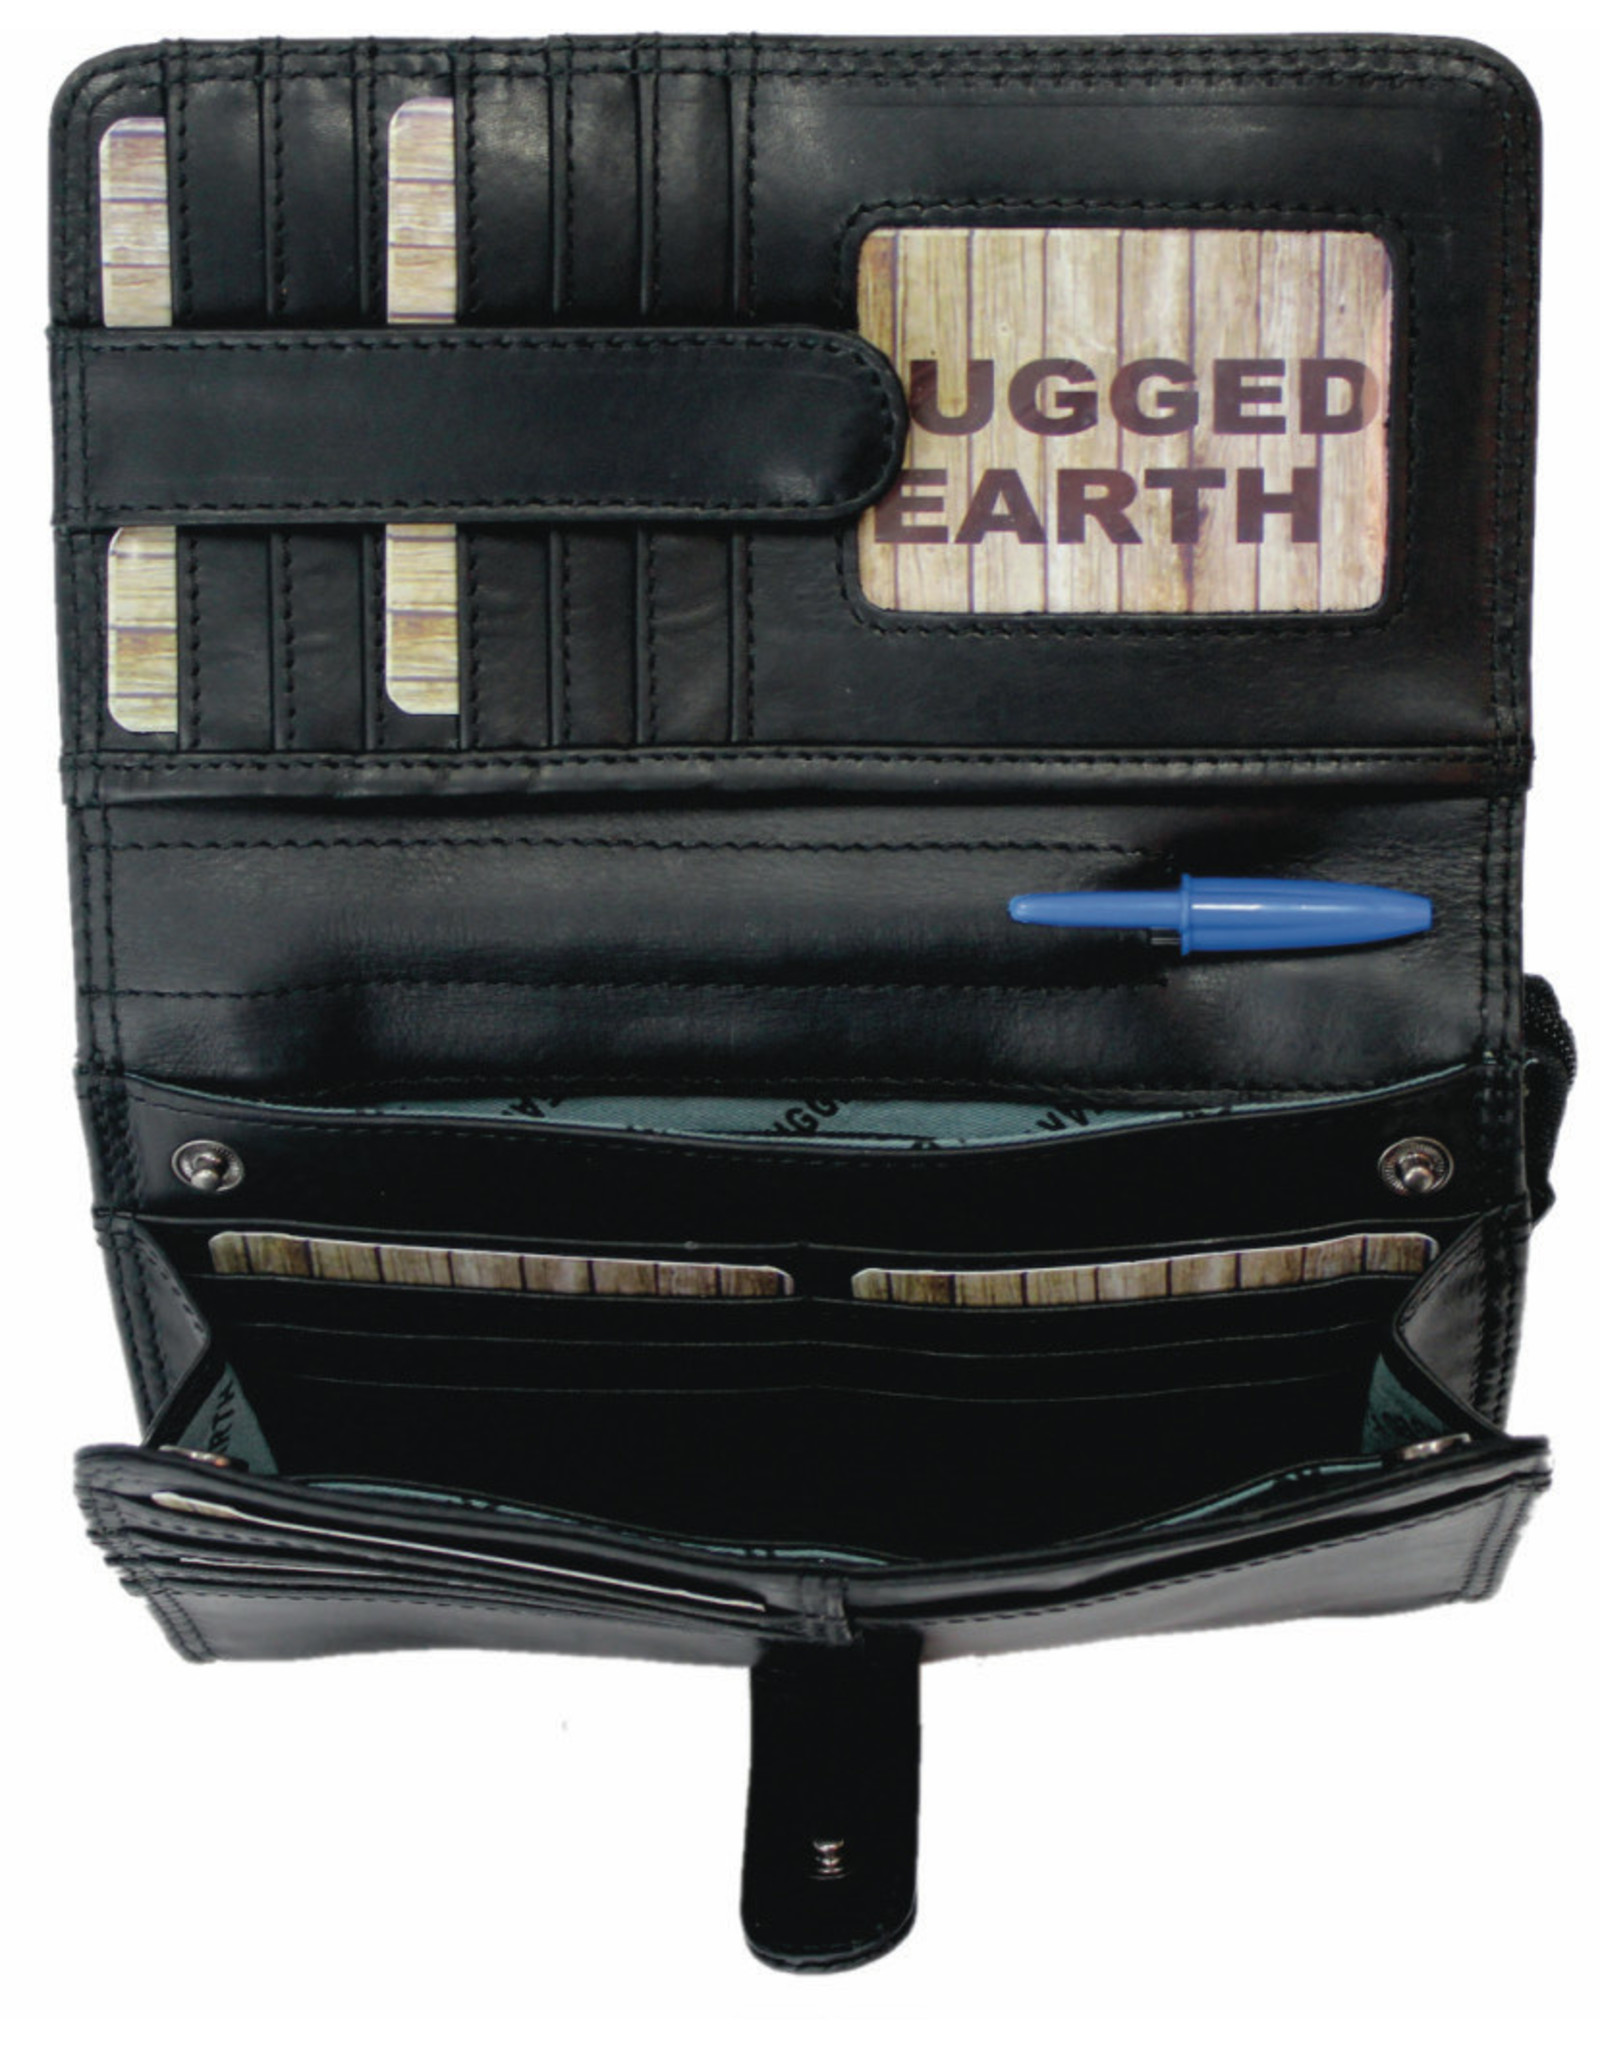 "Rugged Earth Rugged Earth Organiseur 188020 Black W 8""*H 55""D 2"""